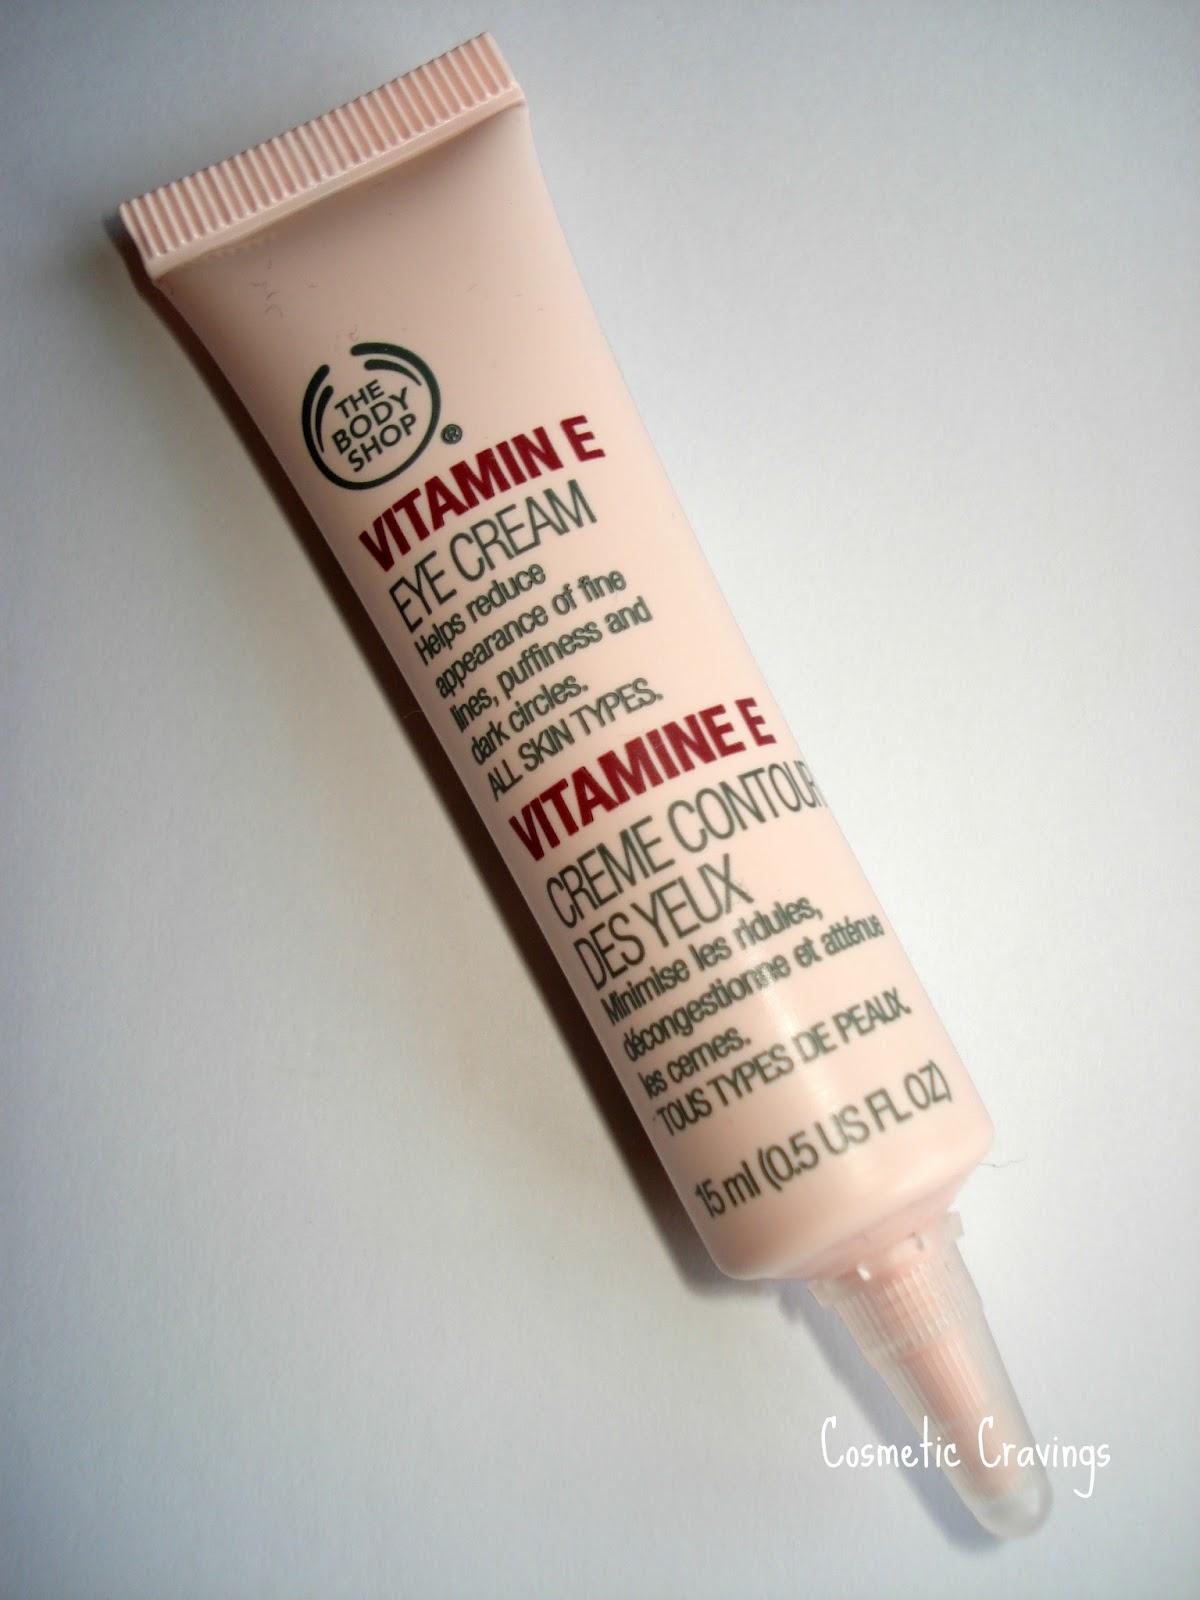 body shop vitamin c eye cream review